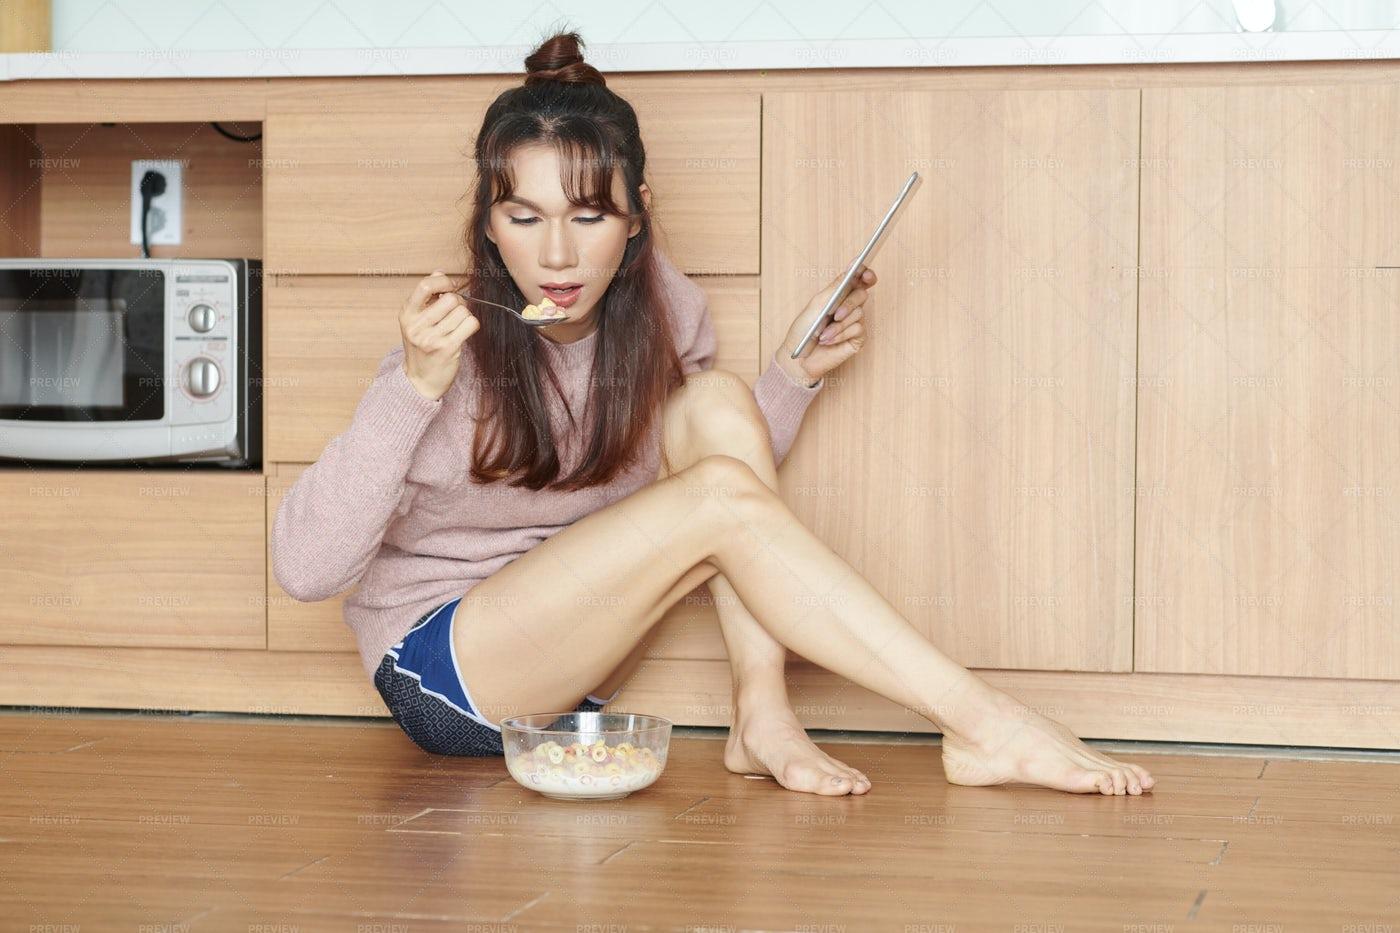 Woman Eating Cornflakes: Stock Photos